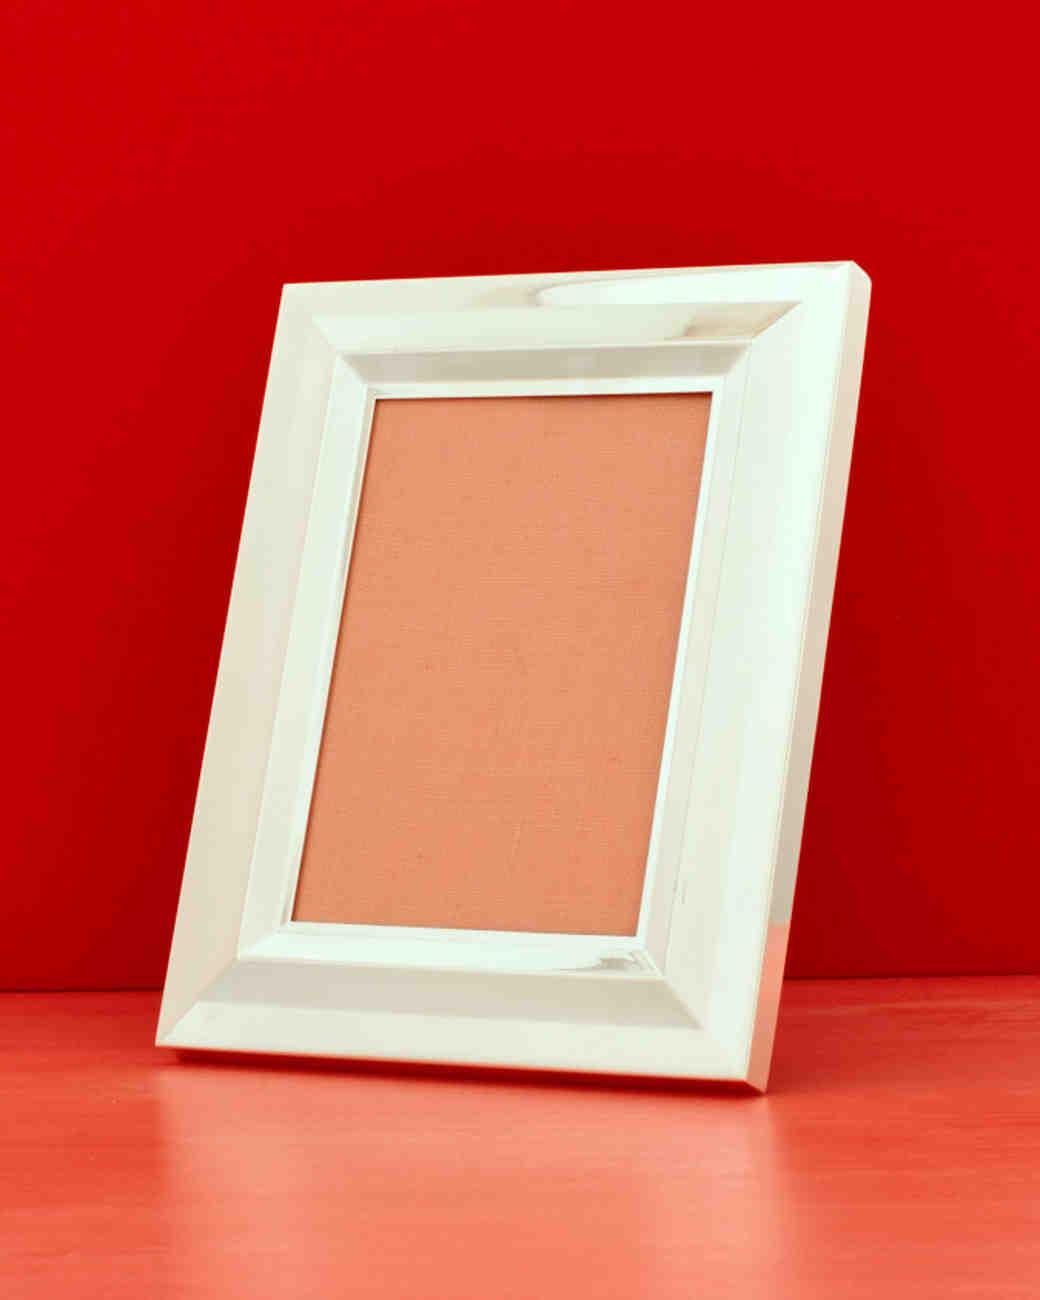 silver-frame-wd107851.jpg